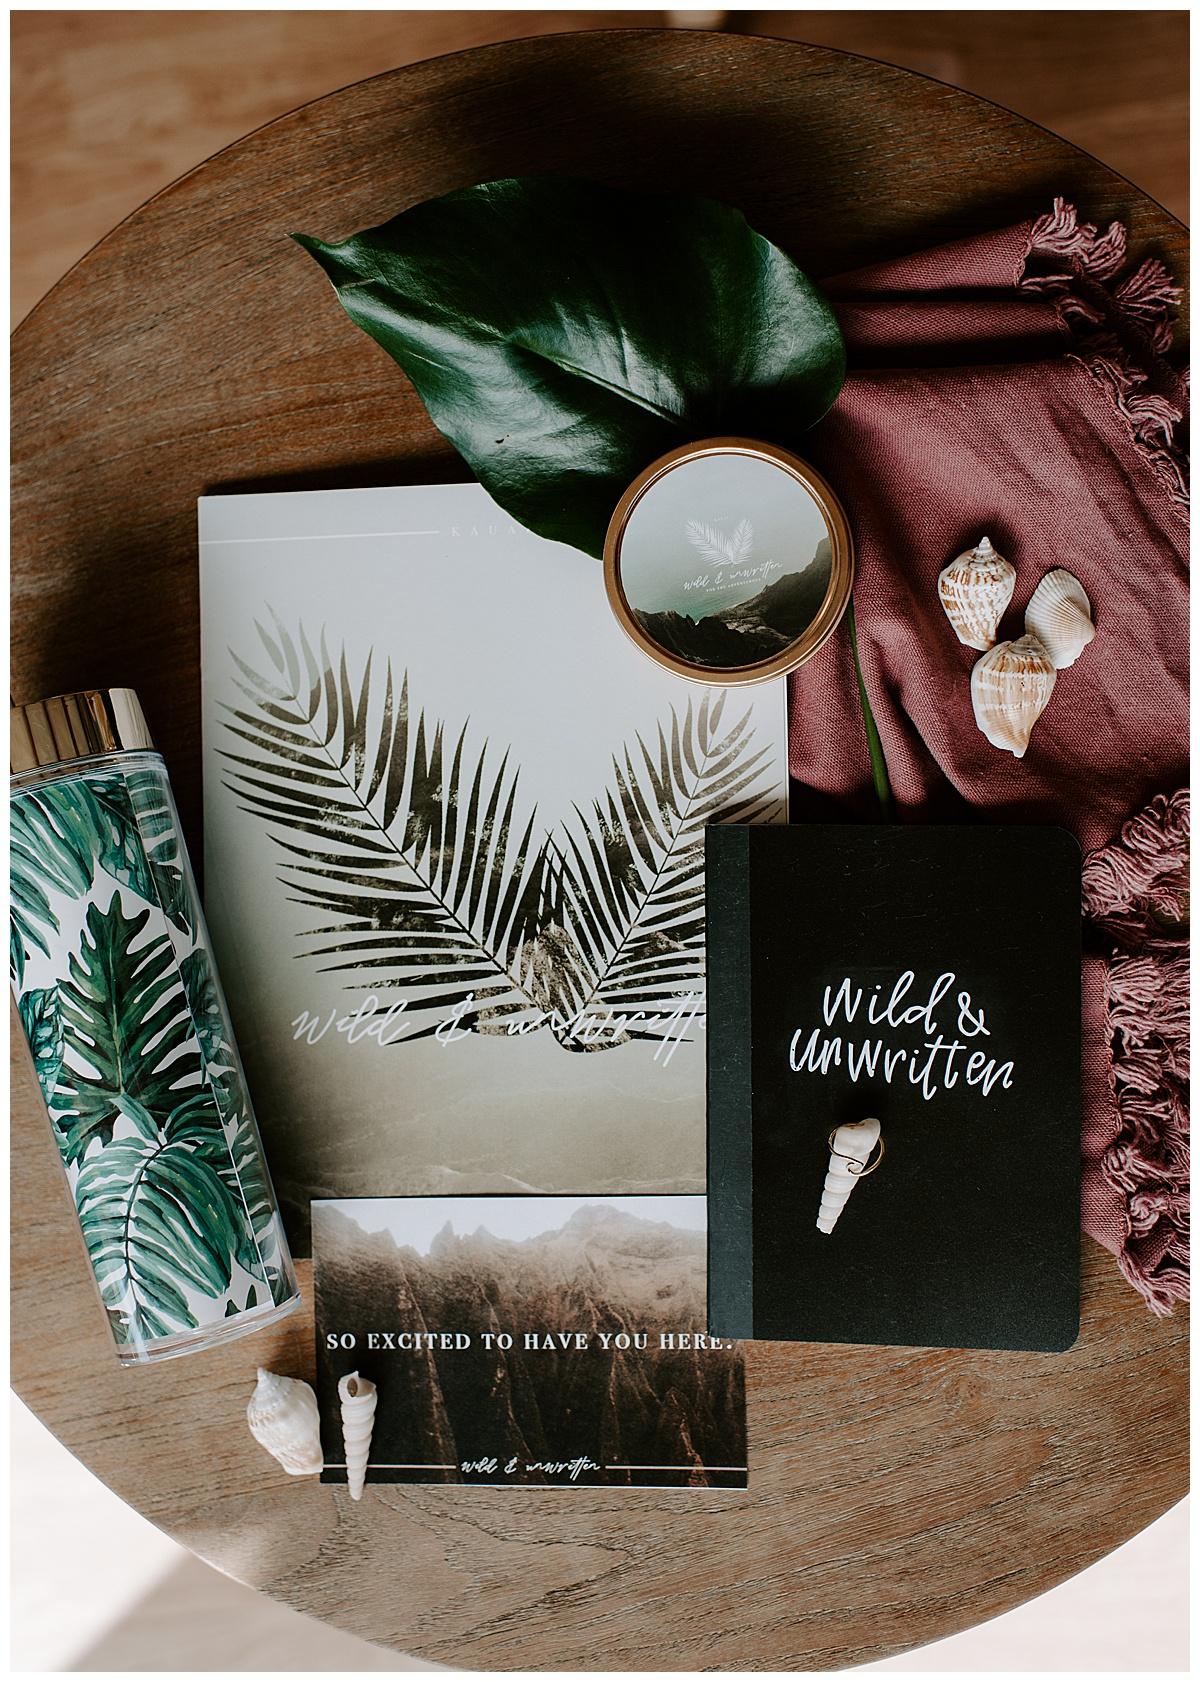 Bixby-+-Pine-Wild-&-Unwritten-Peyton-Rainey-Photography_0001.jpg